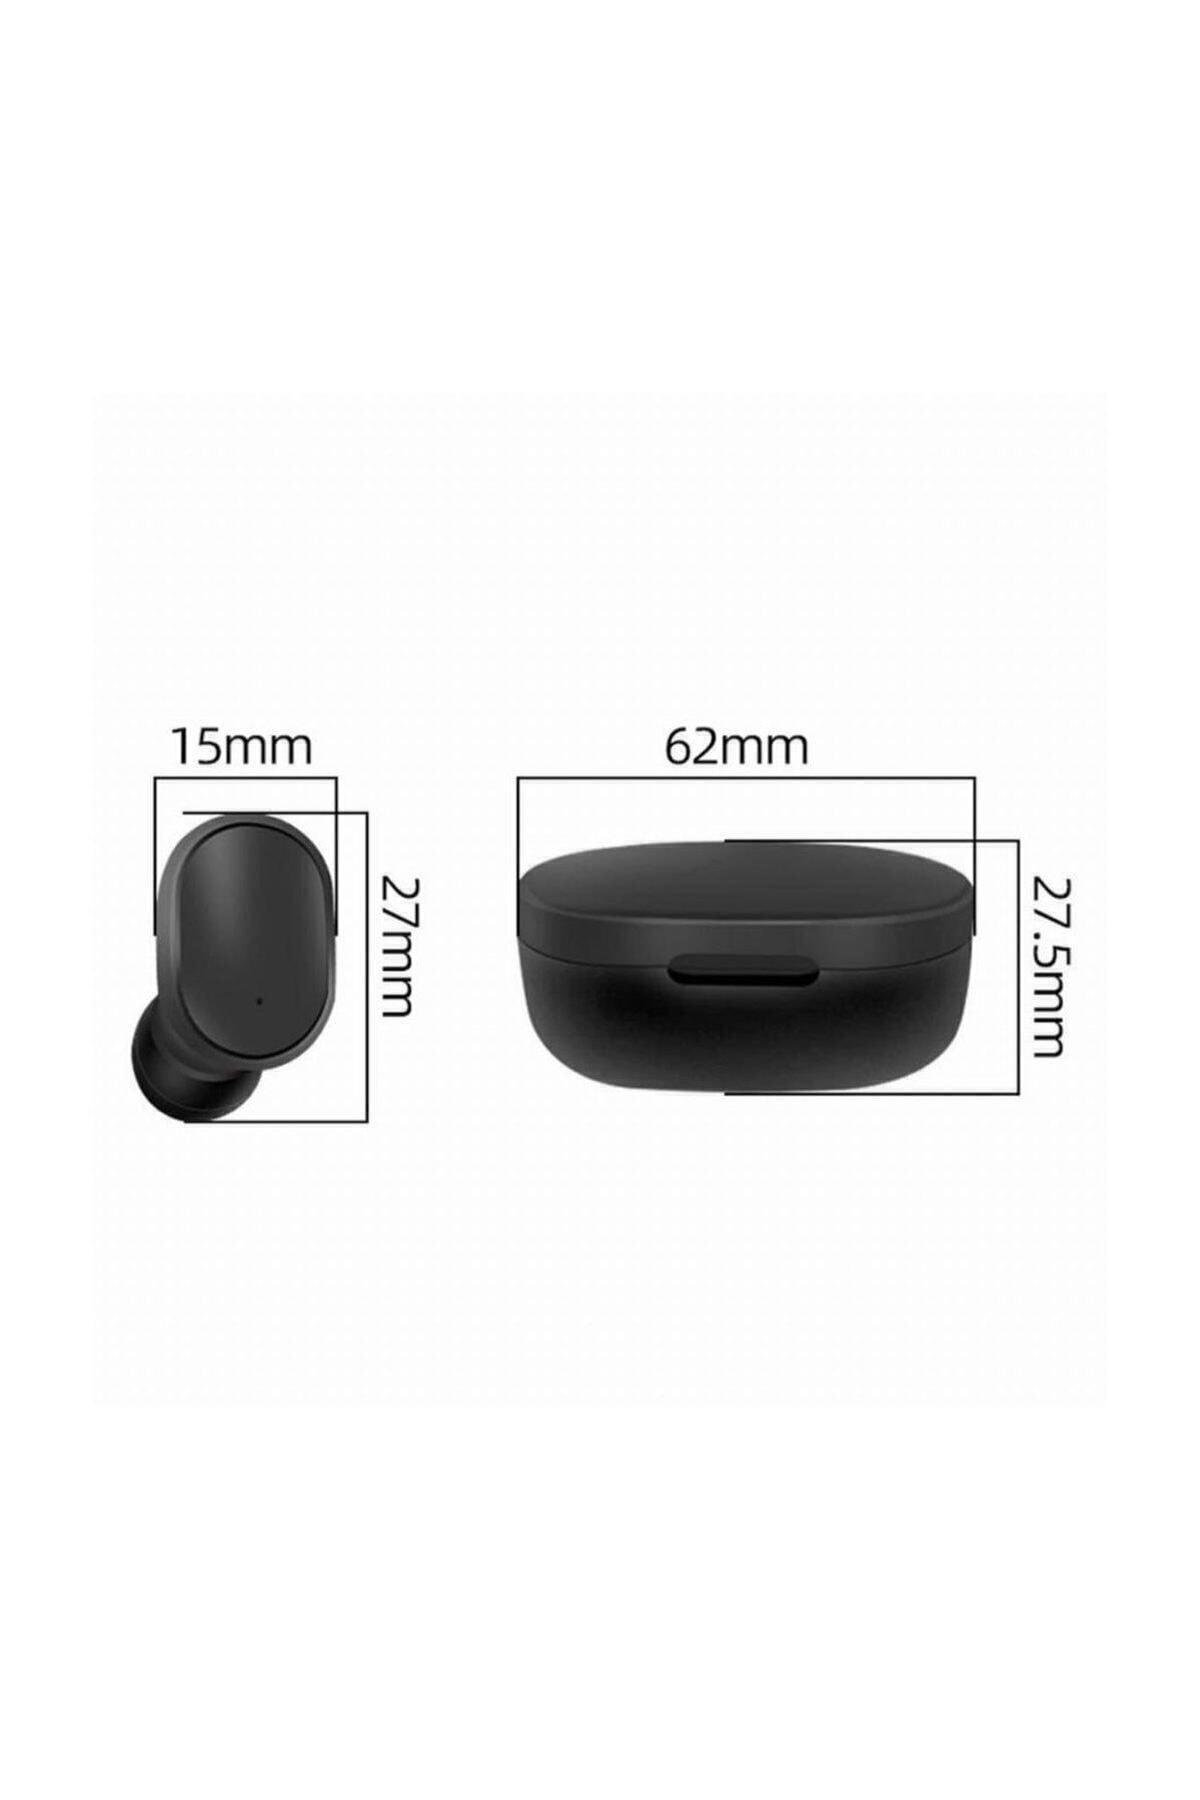 İnova Tws A6s Çift Mikrofonlu Kablosuz Bluetooth 5.0 Powerbankli Kulaklık